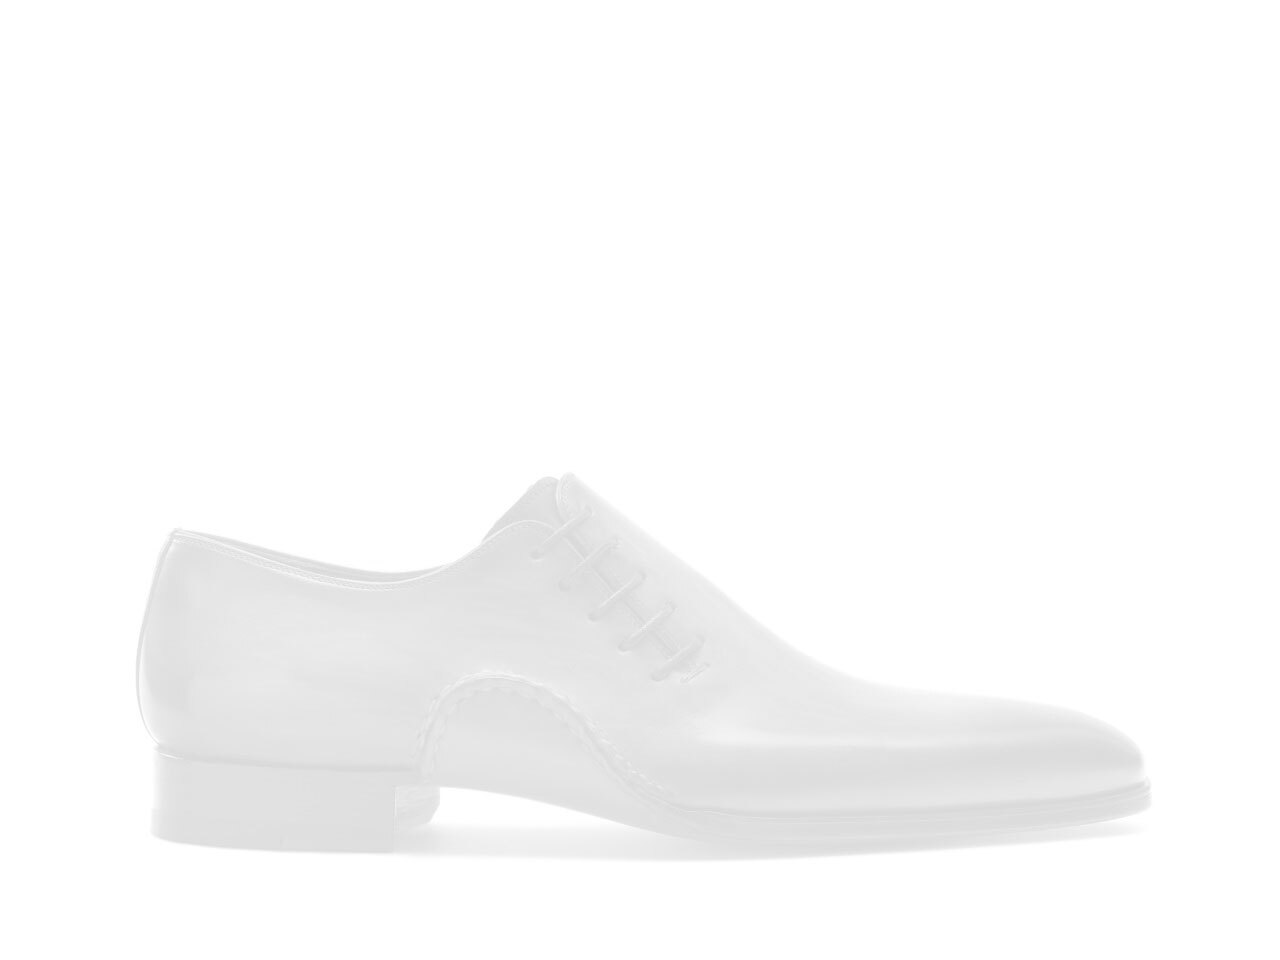 Side view of the Magnanni Coto Lo Cognac Men's Sneakers